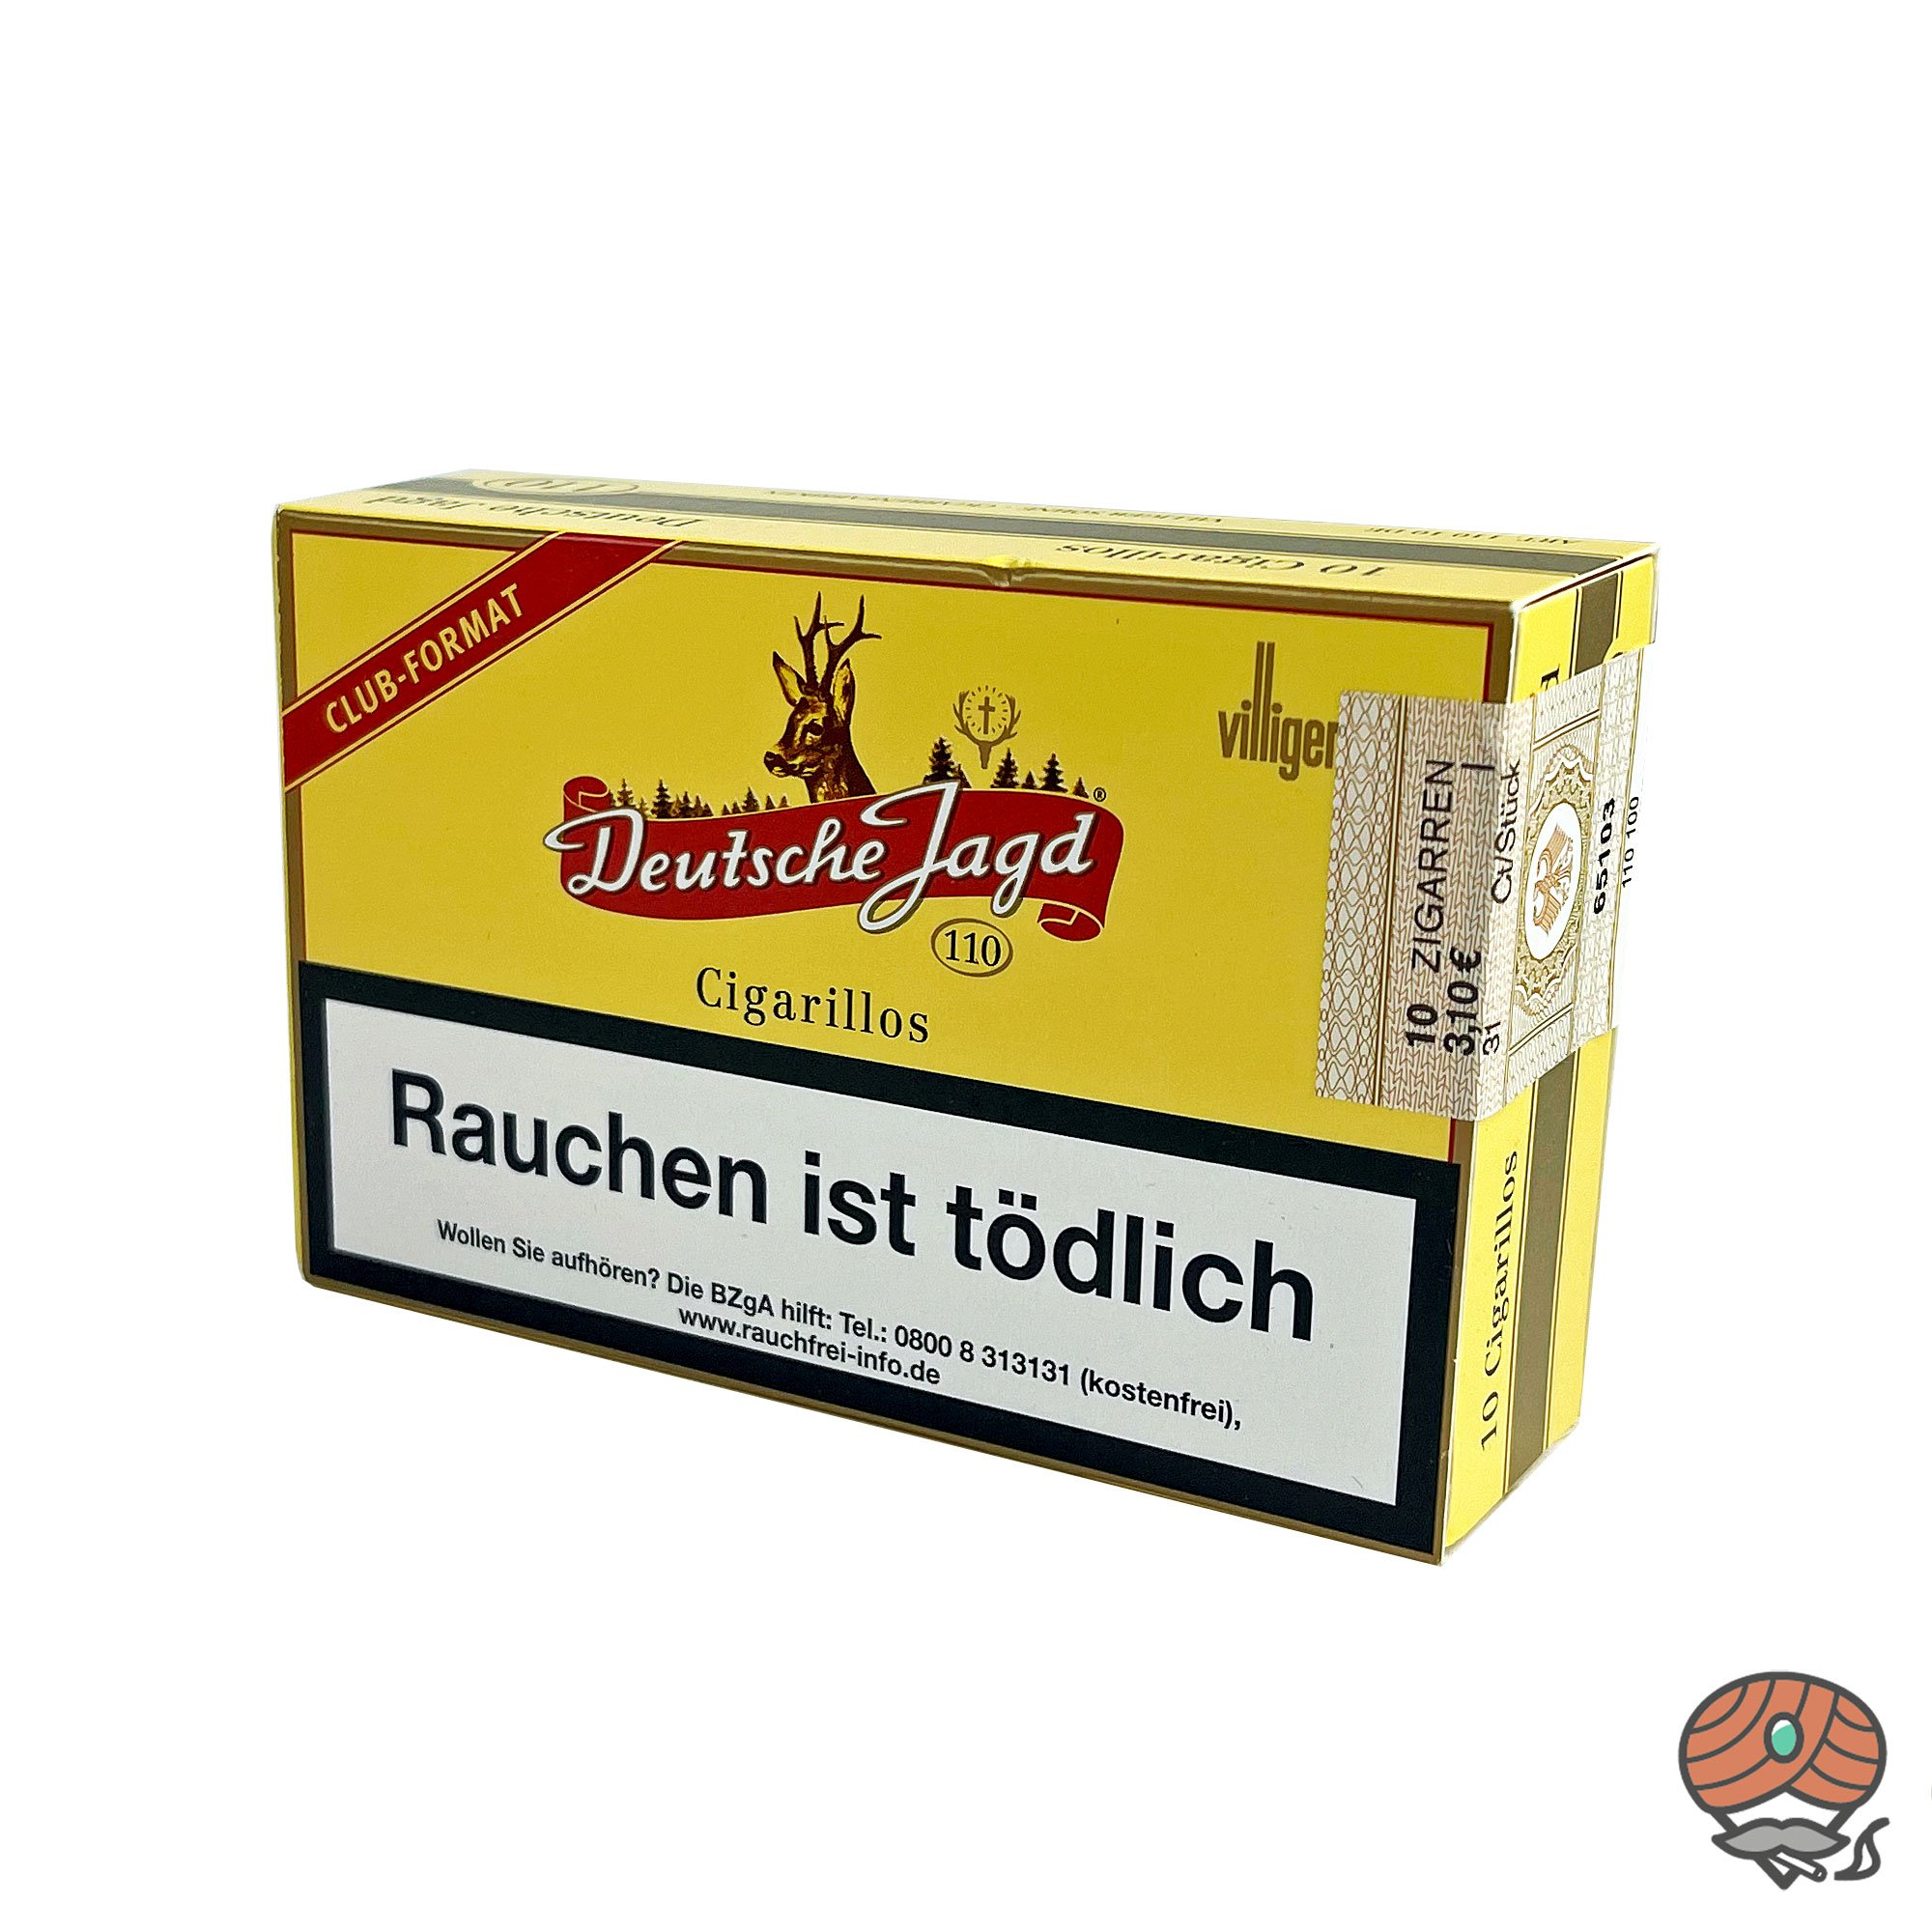 Deutsche Jagd 110 Zigarillos im Club Format